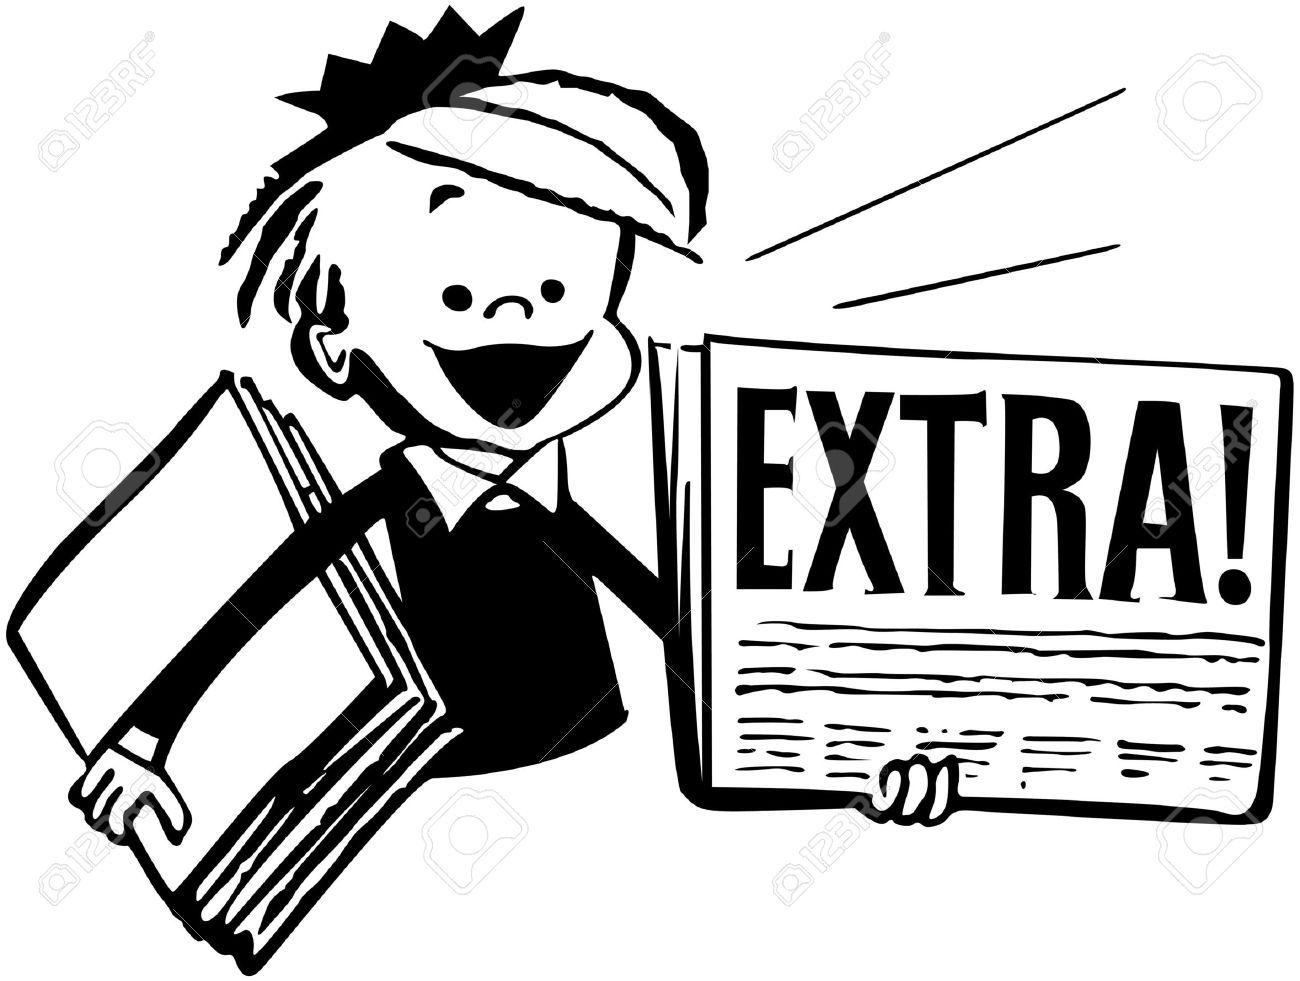 Newspaper editor clipart 3 » Clipart Portal.